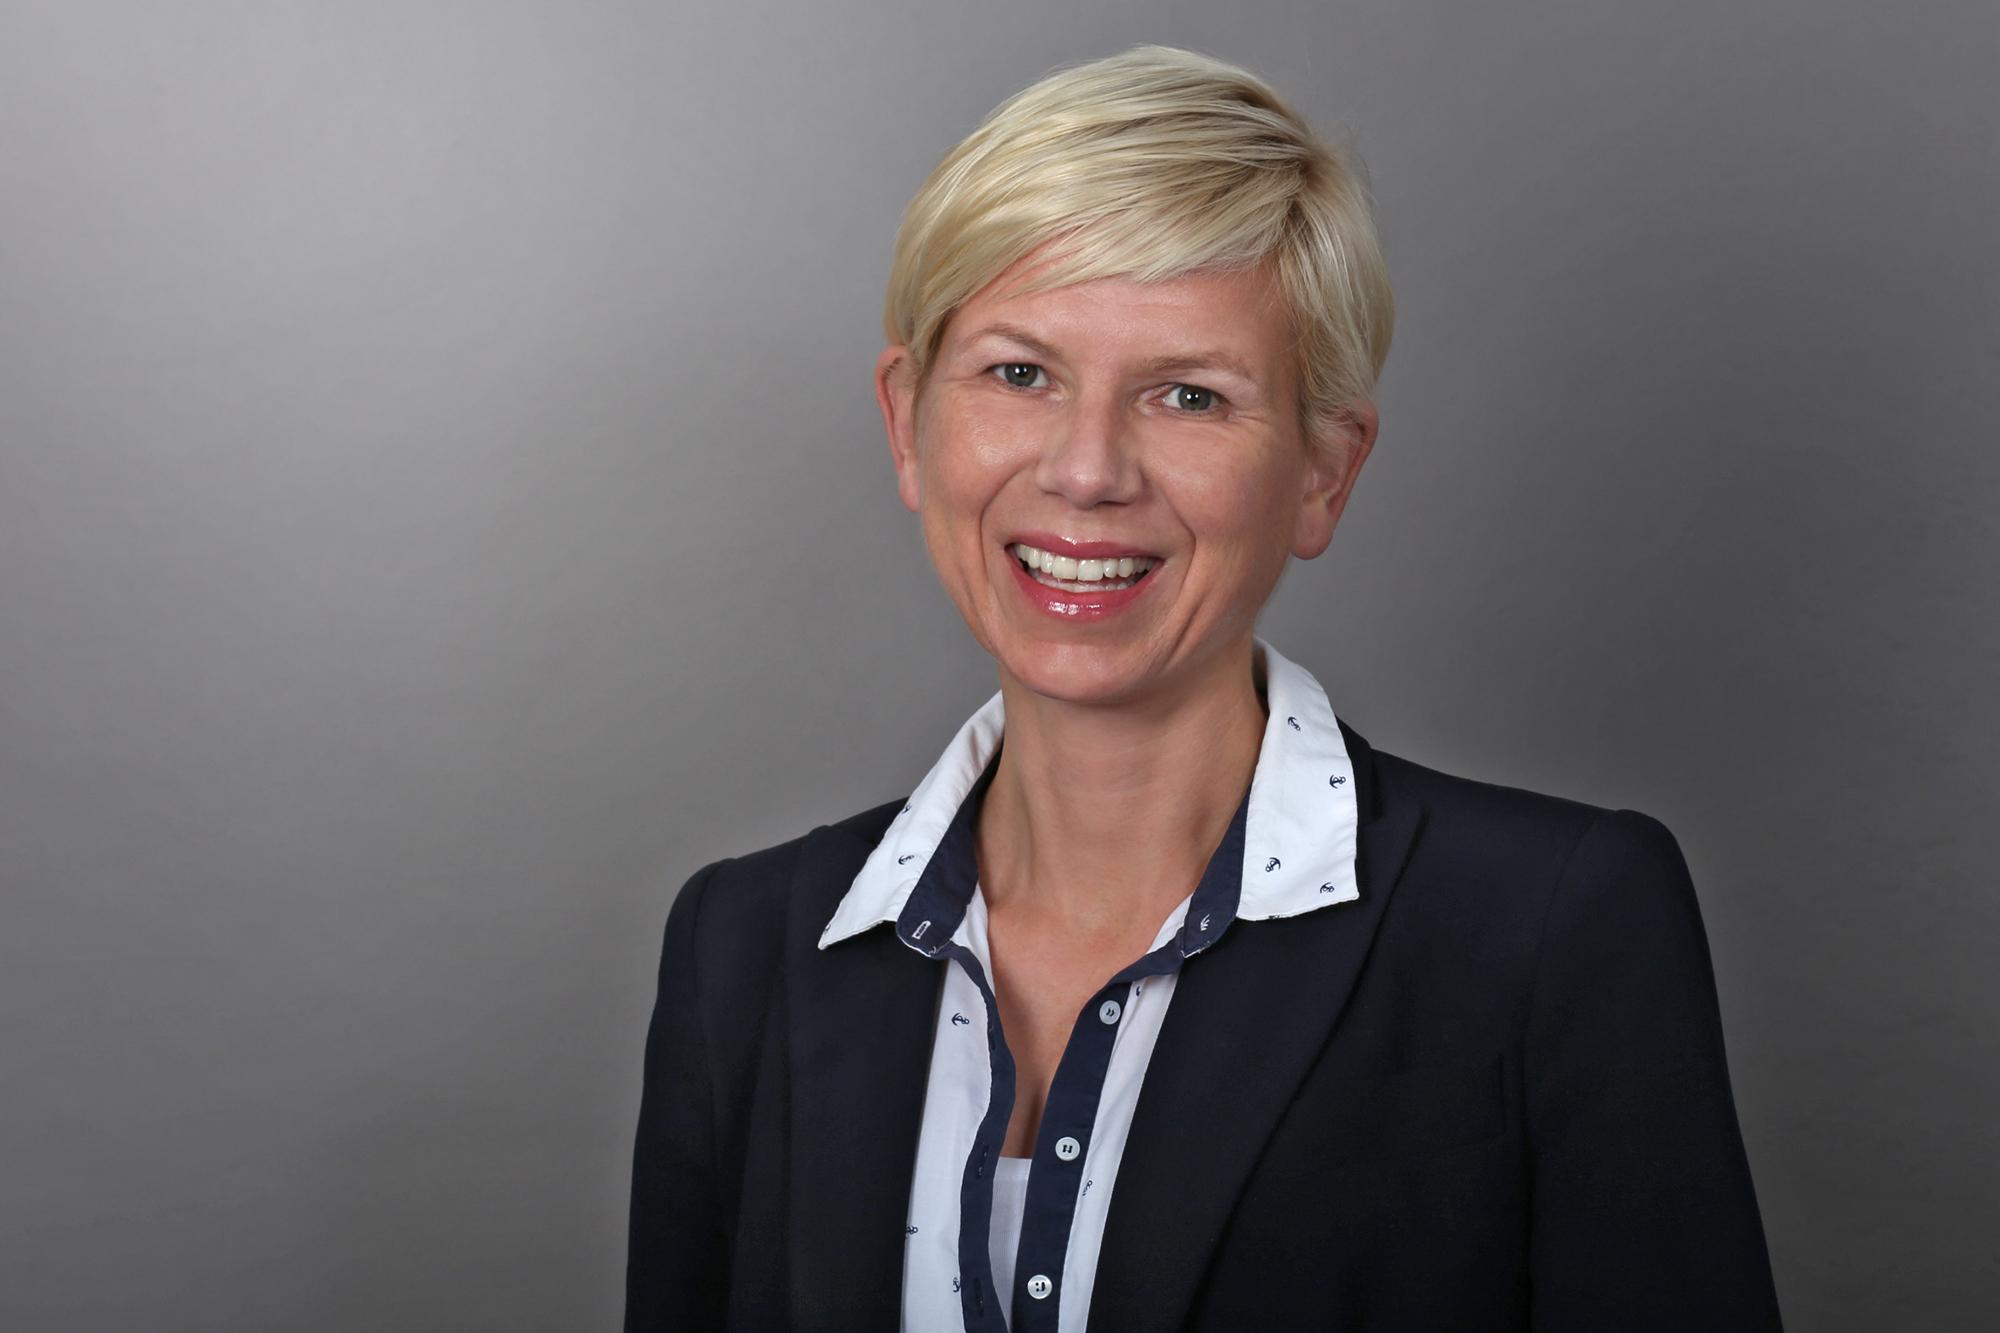 Melanie Ebner Bürgermeisterkandidatin der Wählergruppe ACHTSAM